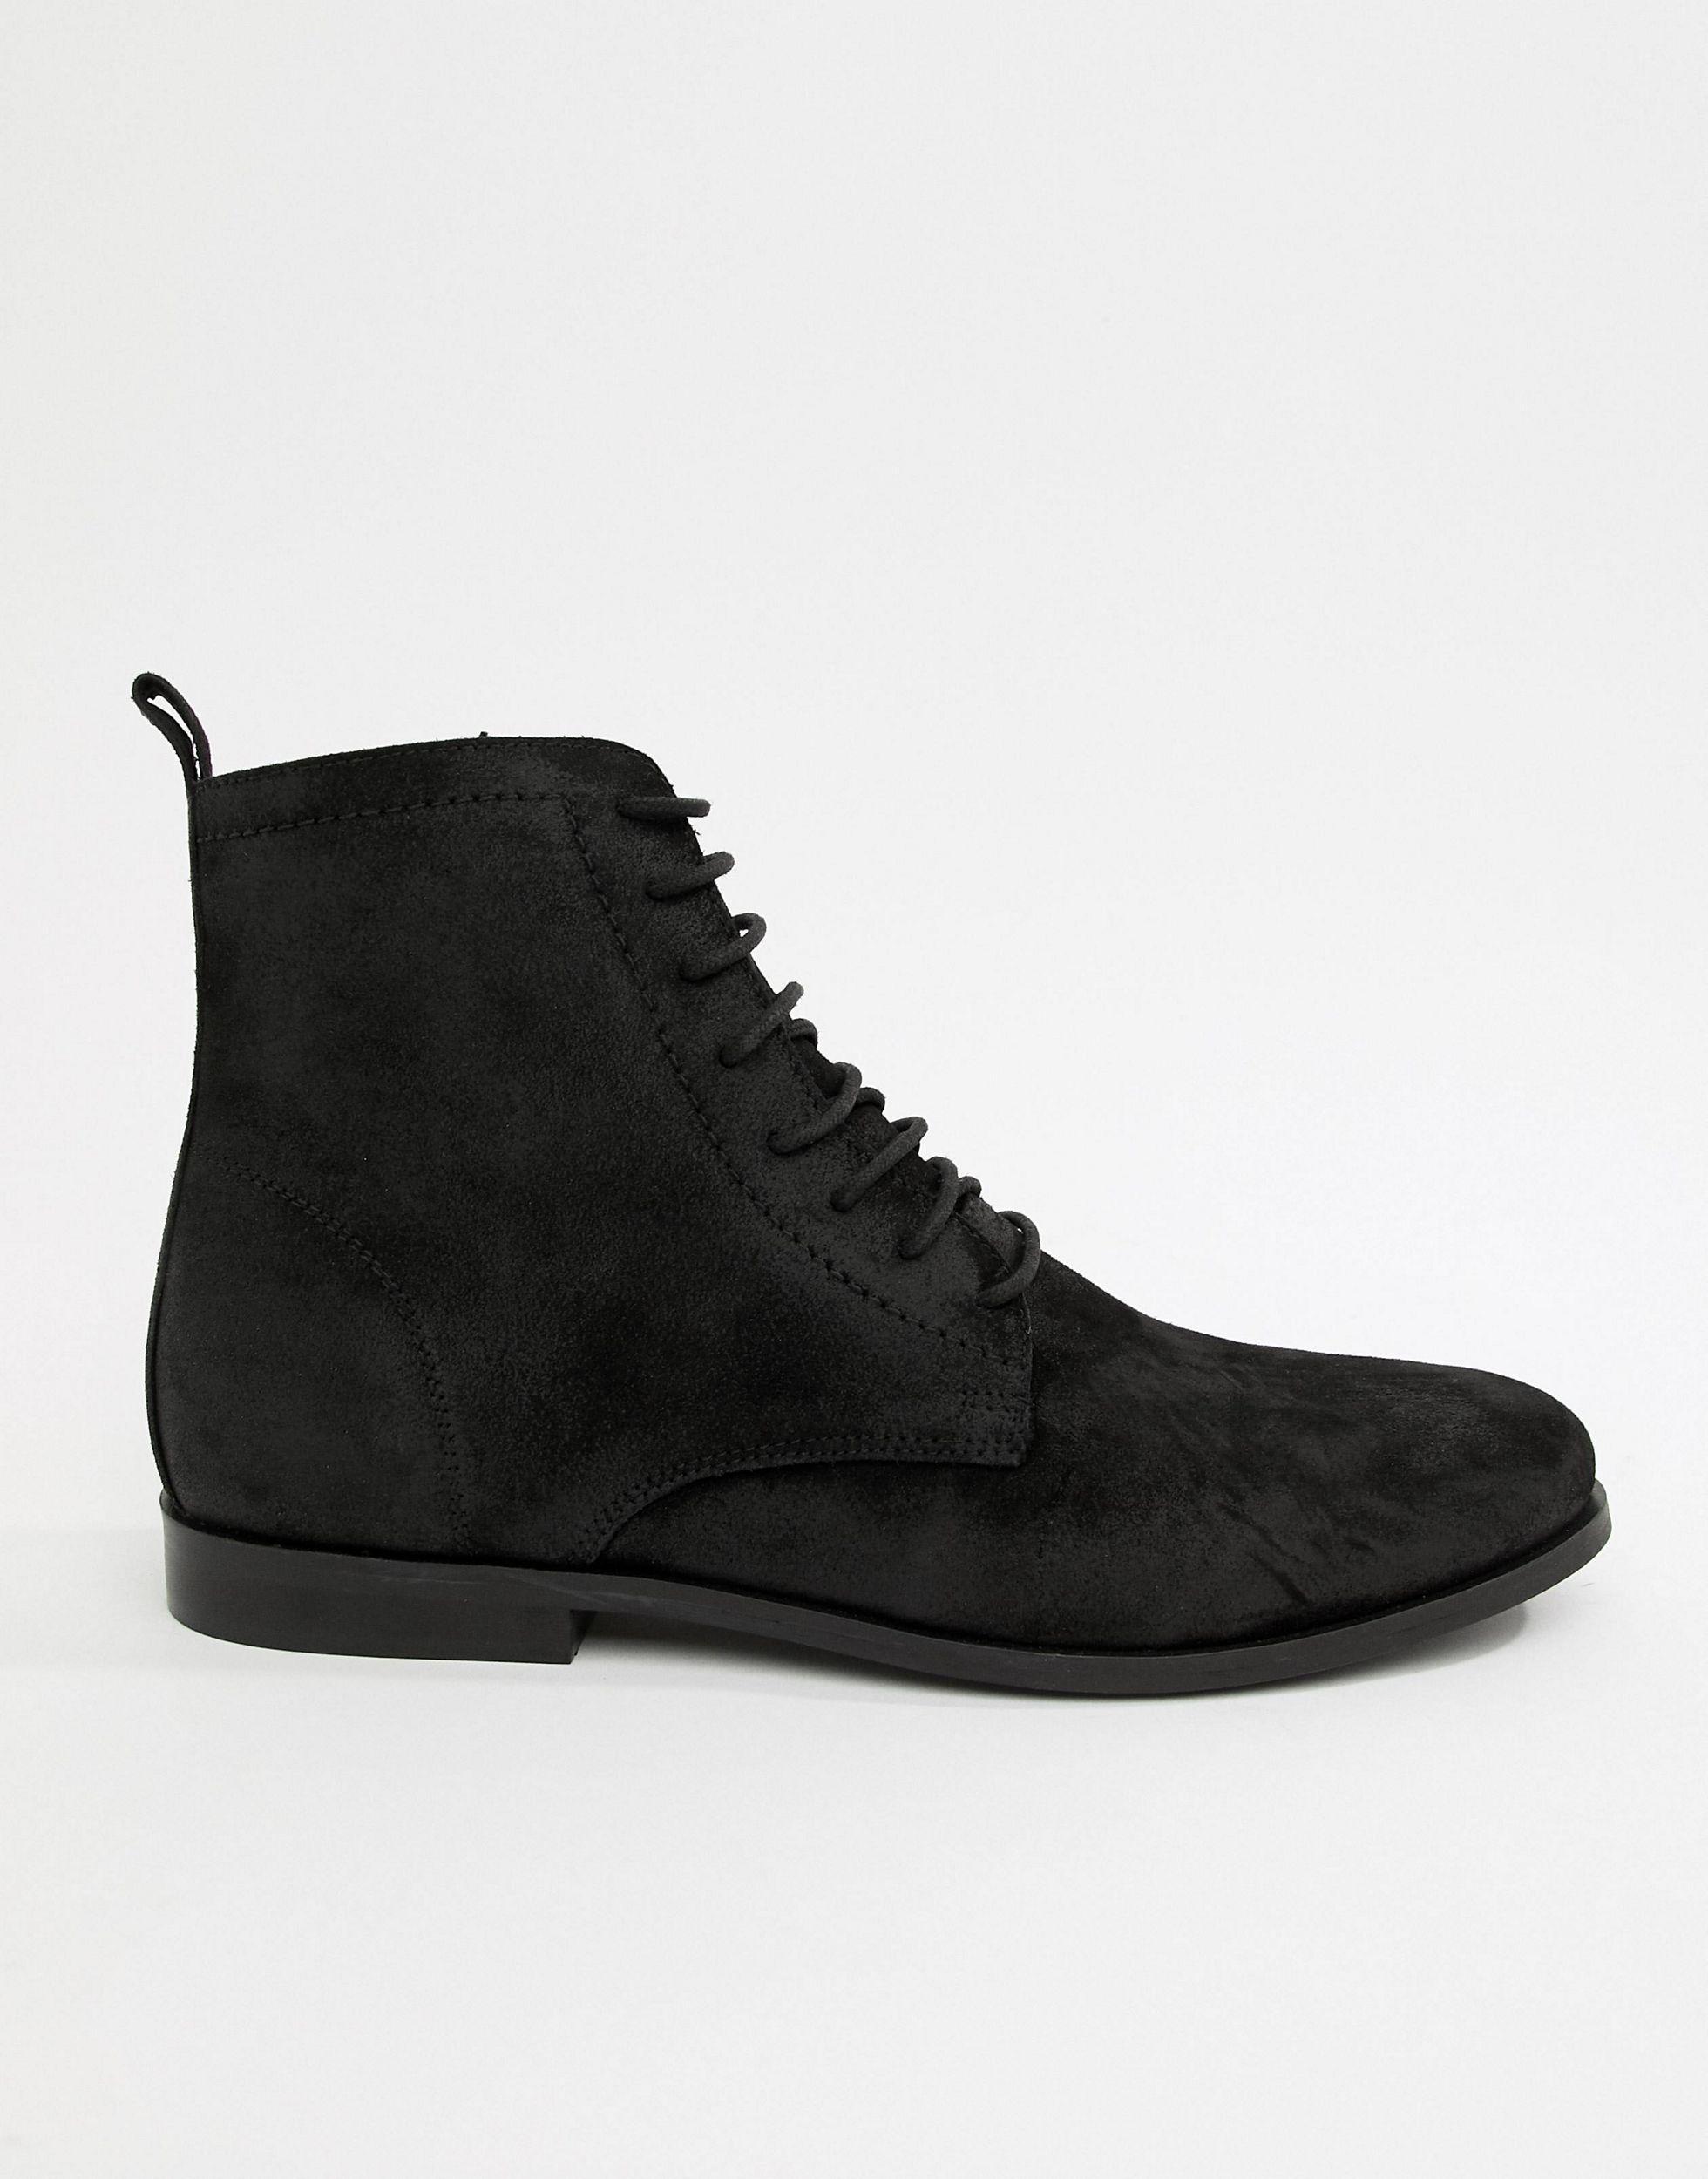 Kurt Geiger Suede Lace Up Boots